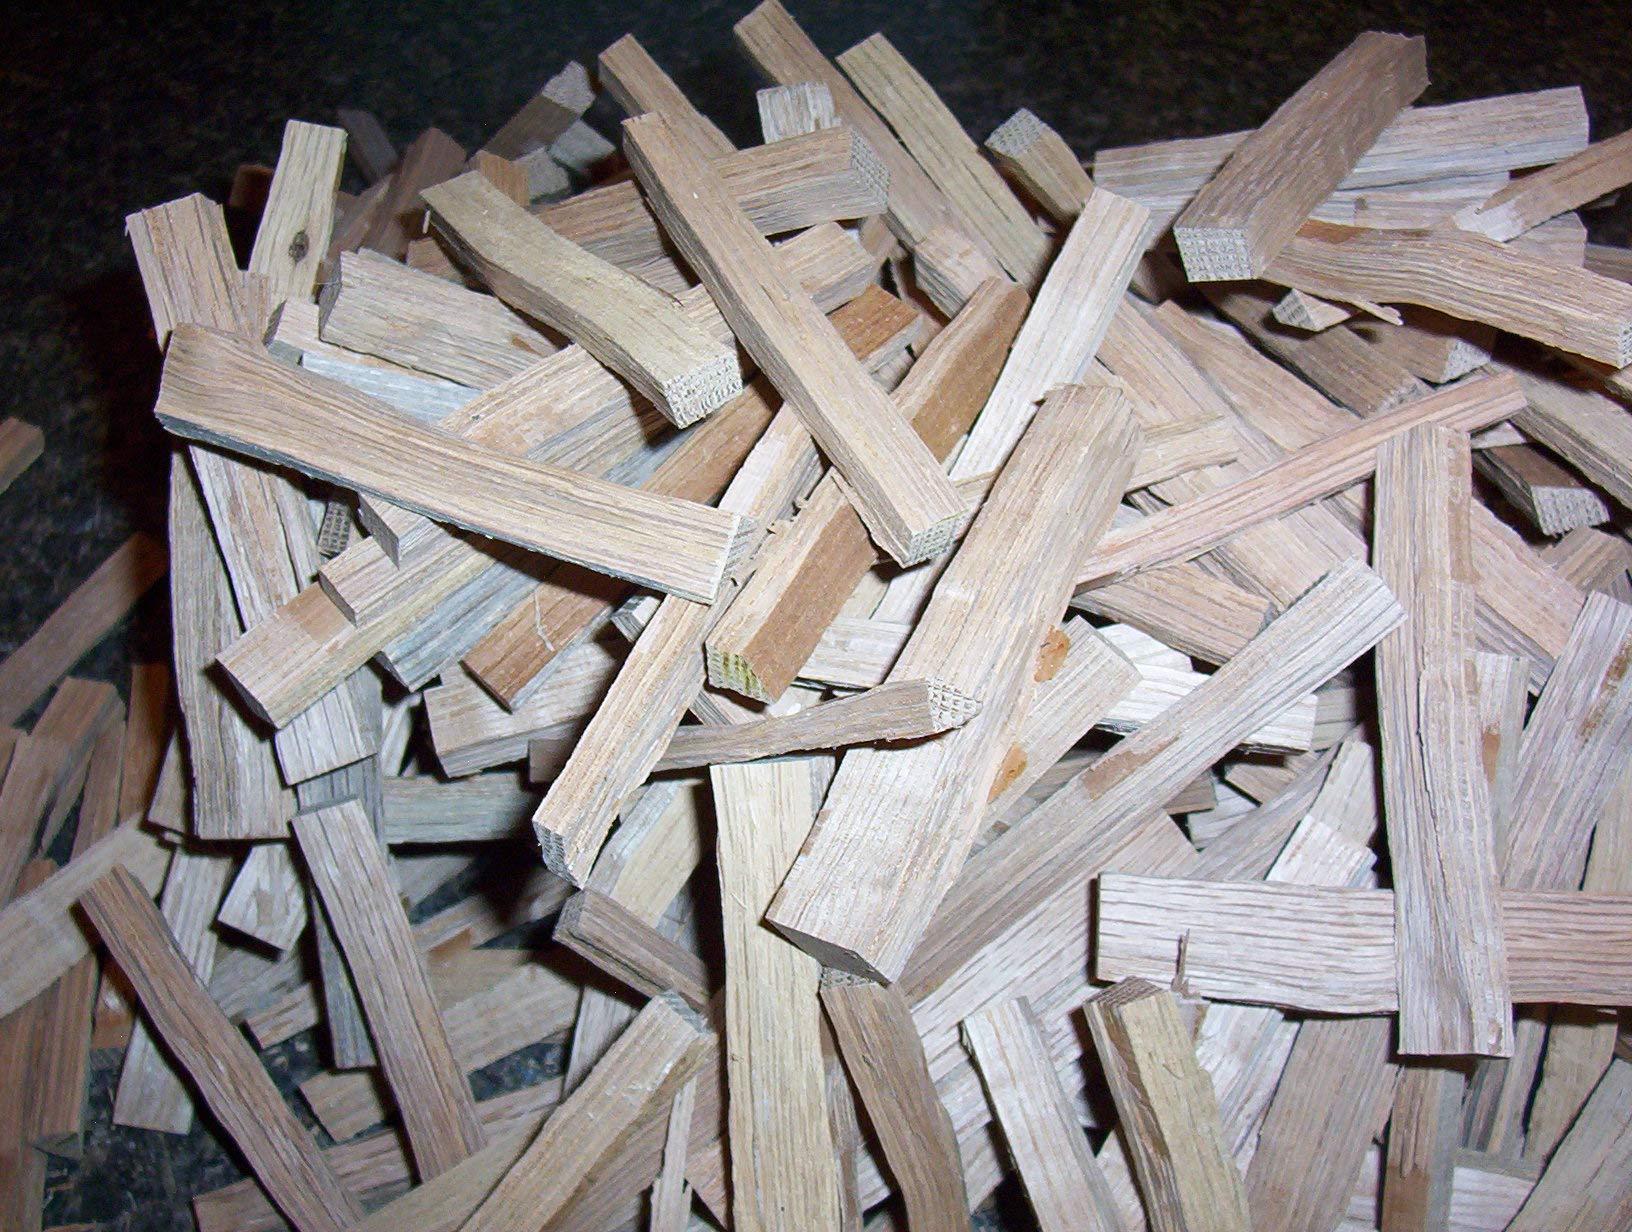 American White Oak Sticks, Kiln Dried. You Toast or Char, 2 Pounds